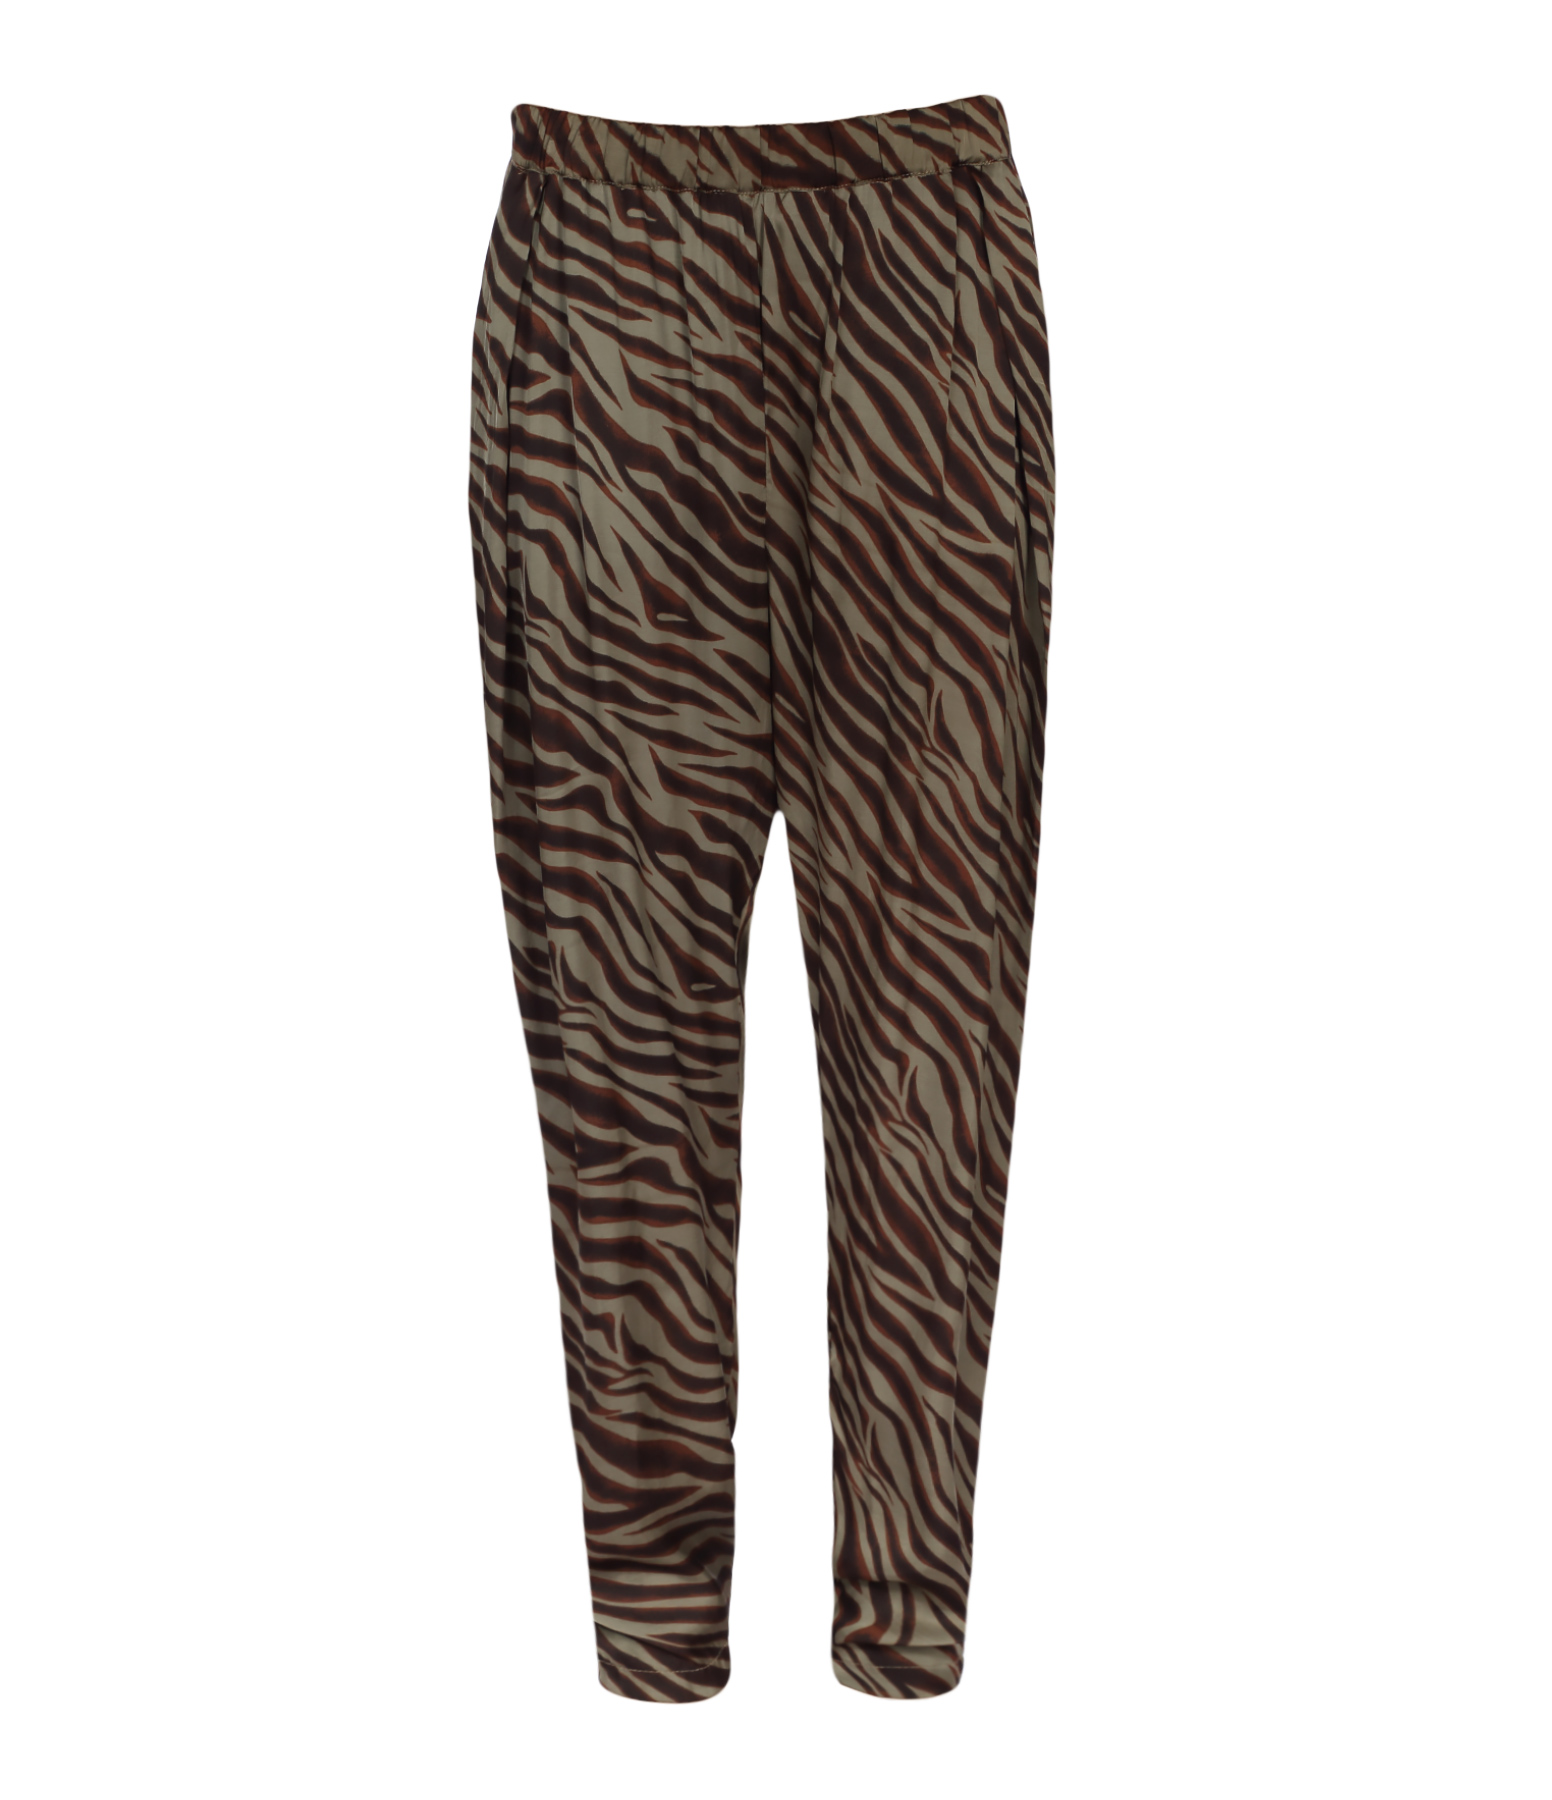 Pantalon Chloé Zebra Aluminium Brown